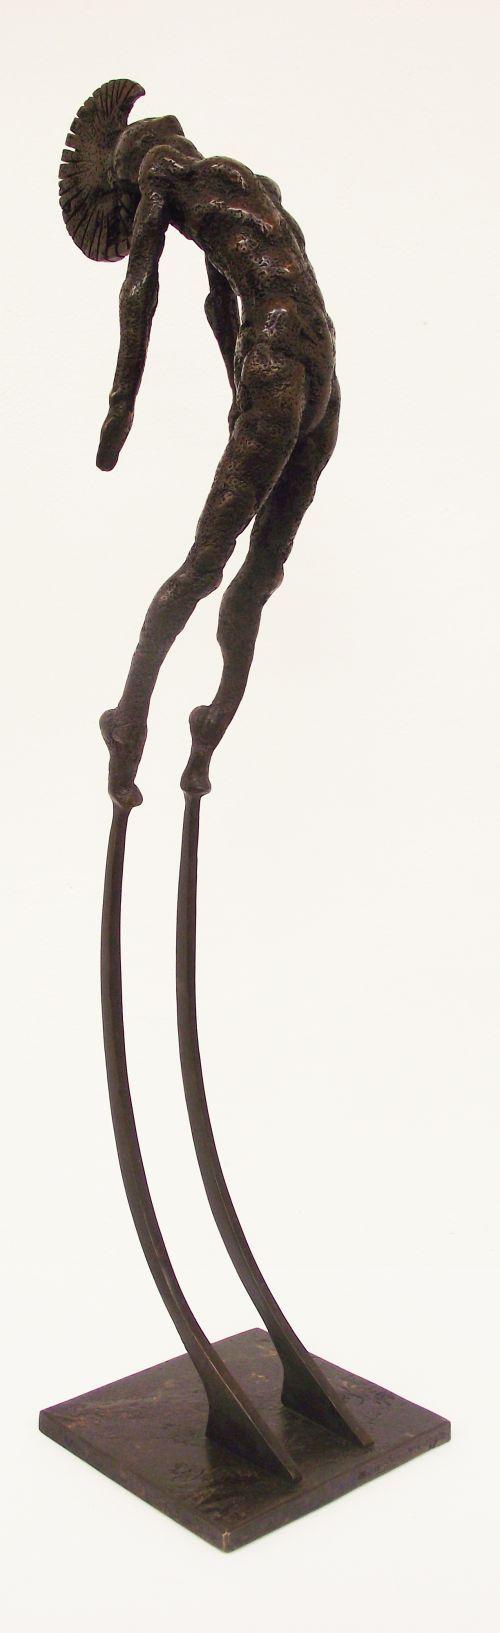 Solid bronze #sculpture by #sculptor John Douglas Joyce titled: 'Blade (Tall Indoor or Outdoor nude Aztec Style statue sculpture statue)'. #JohnDouglasJoyce